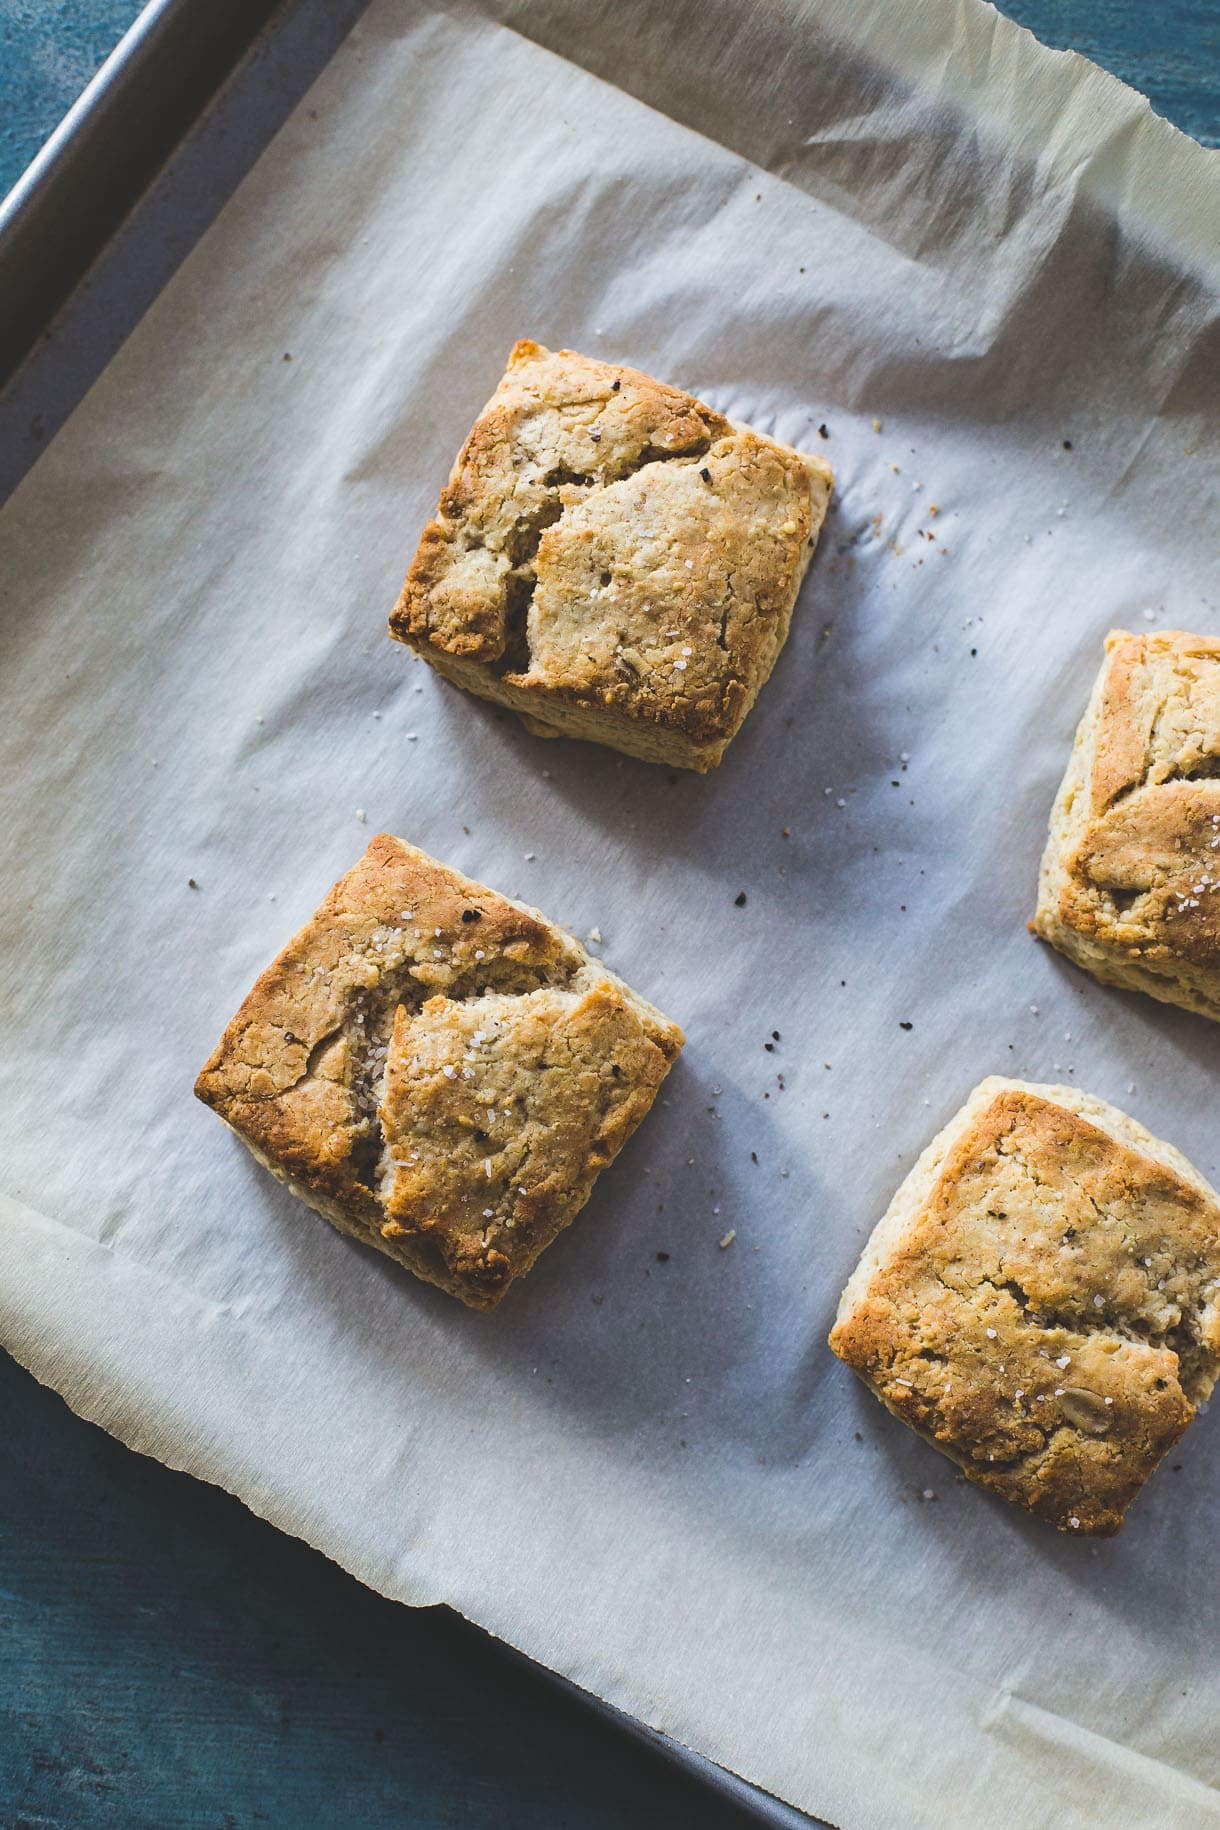 Life Changing Gluten-Free Biscuits {gum-free, nut-free} alternative grain baking